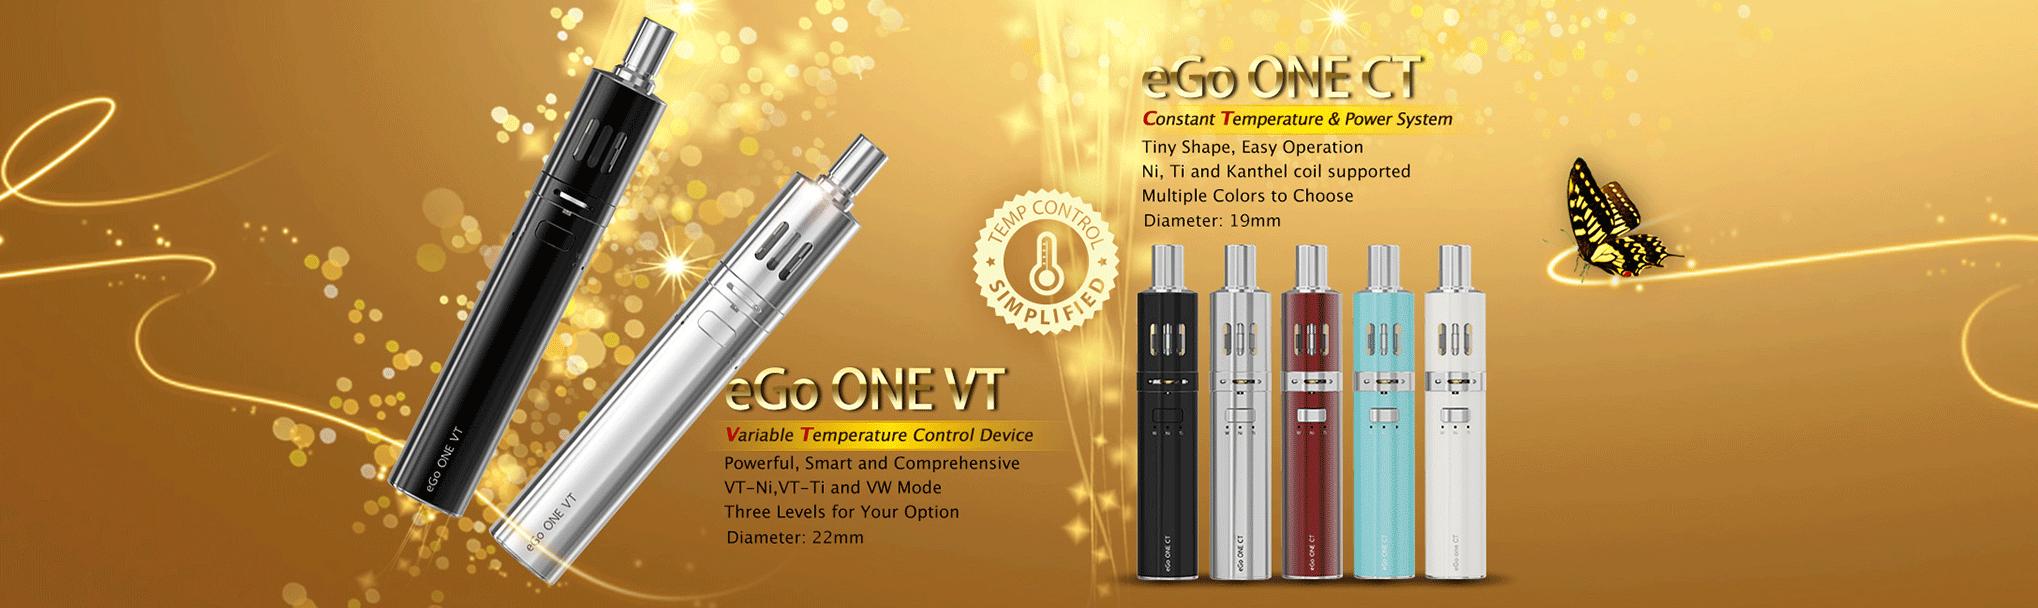 Ego-One-CT